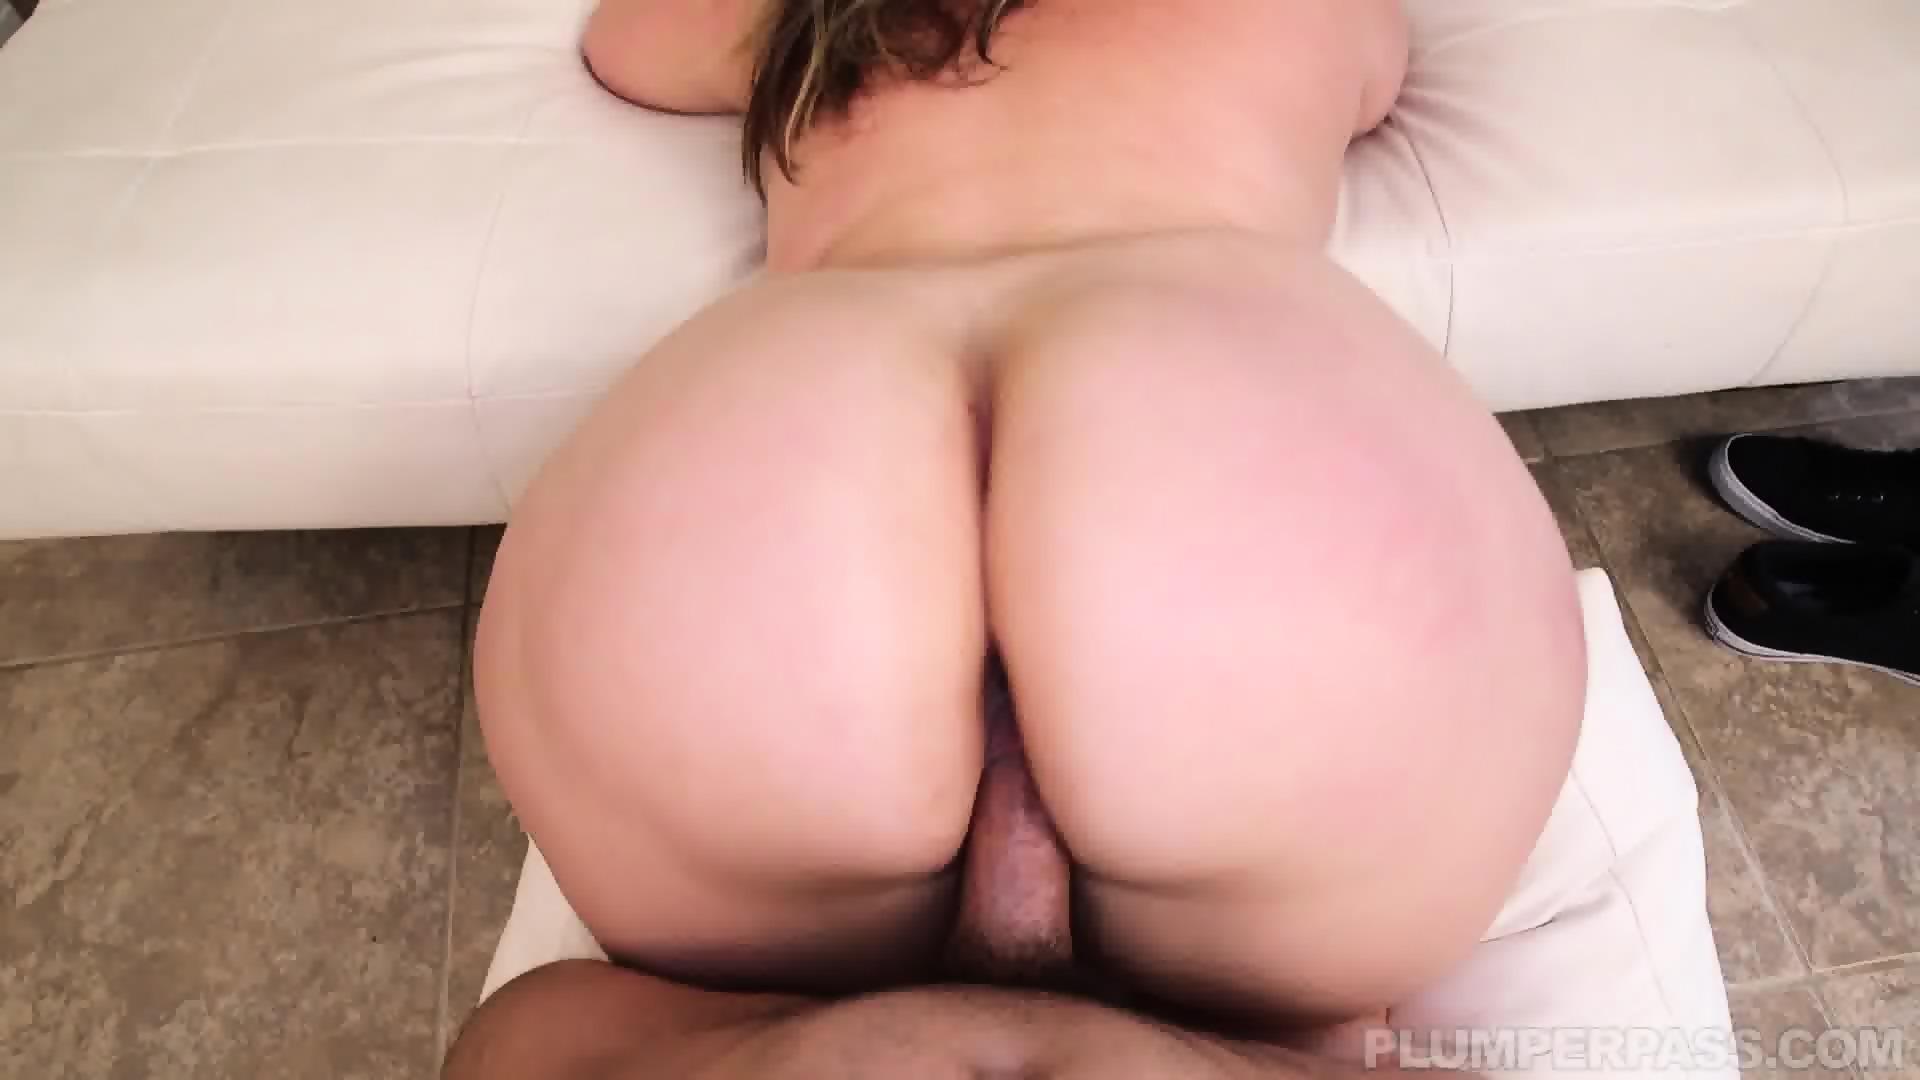 Big booty pawg mazzaratie monica takes on shane diesel - 1 part 7